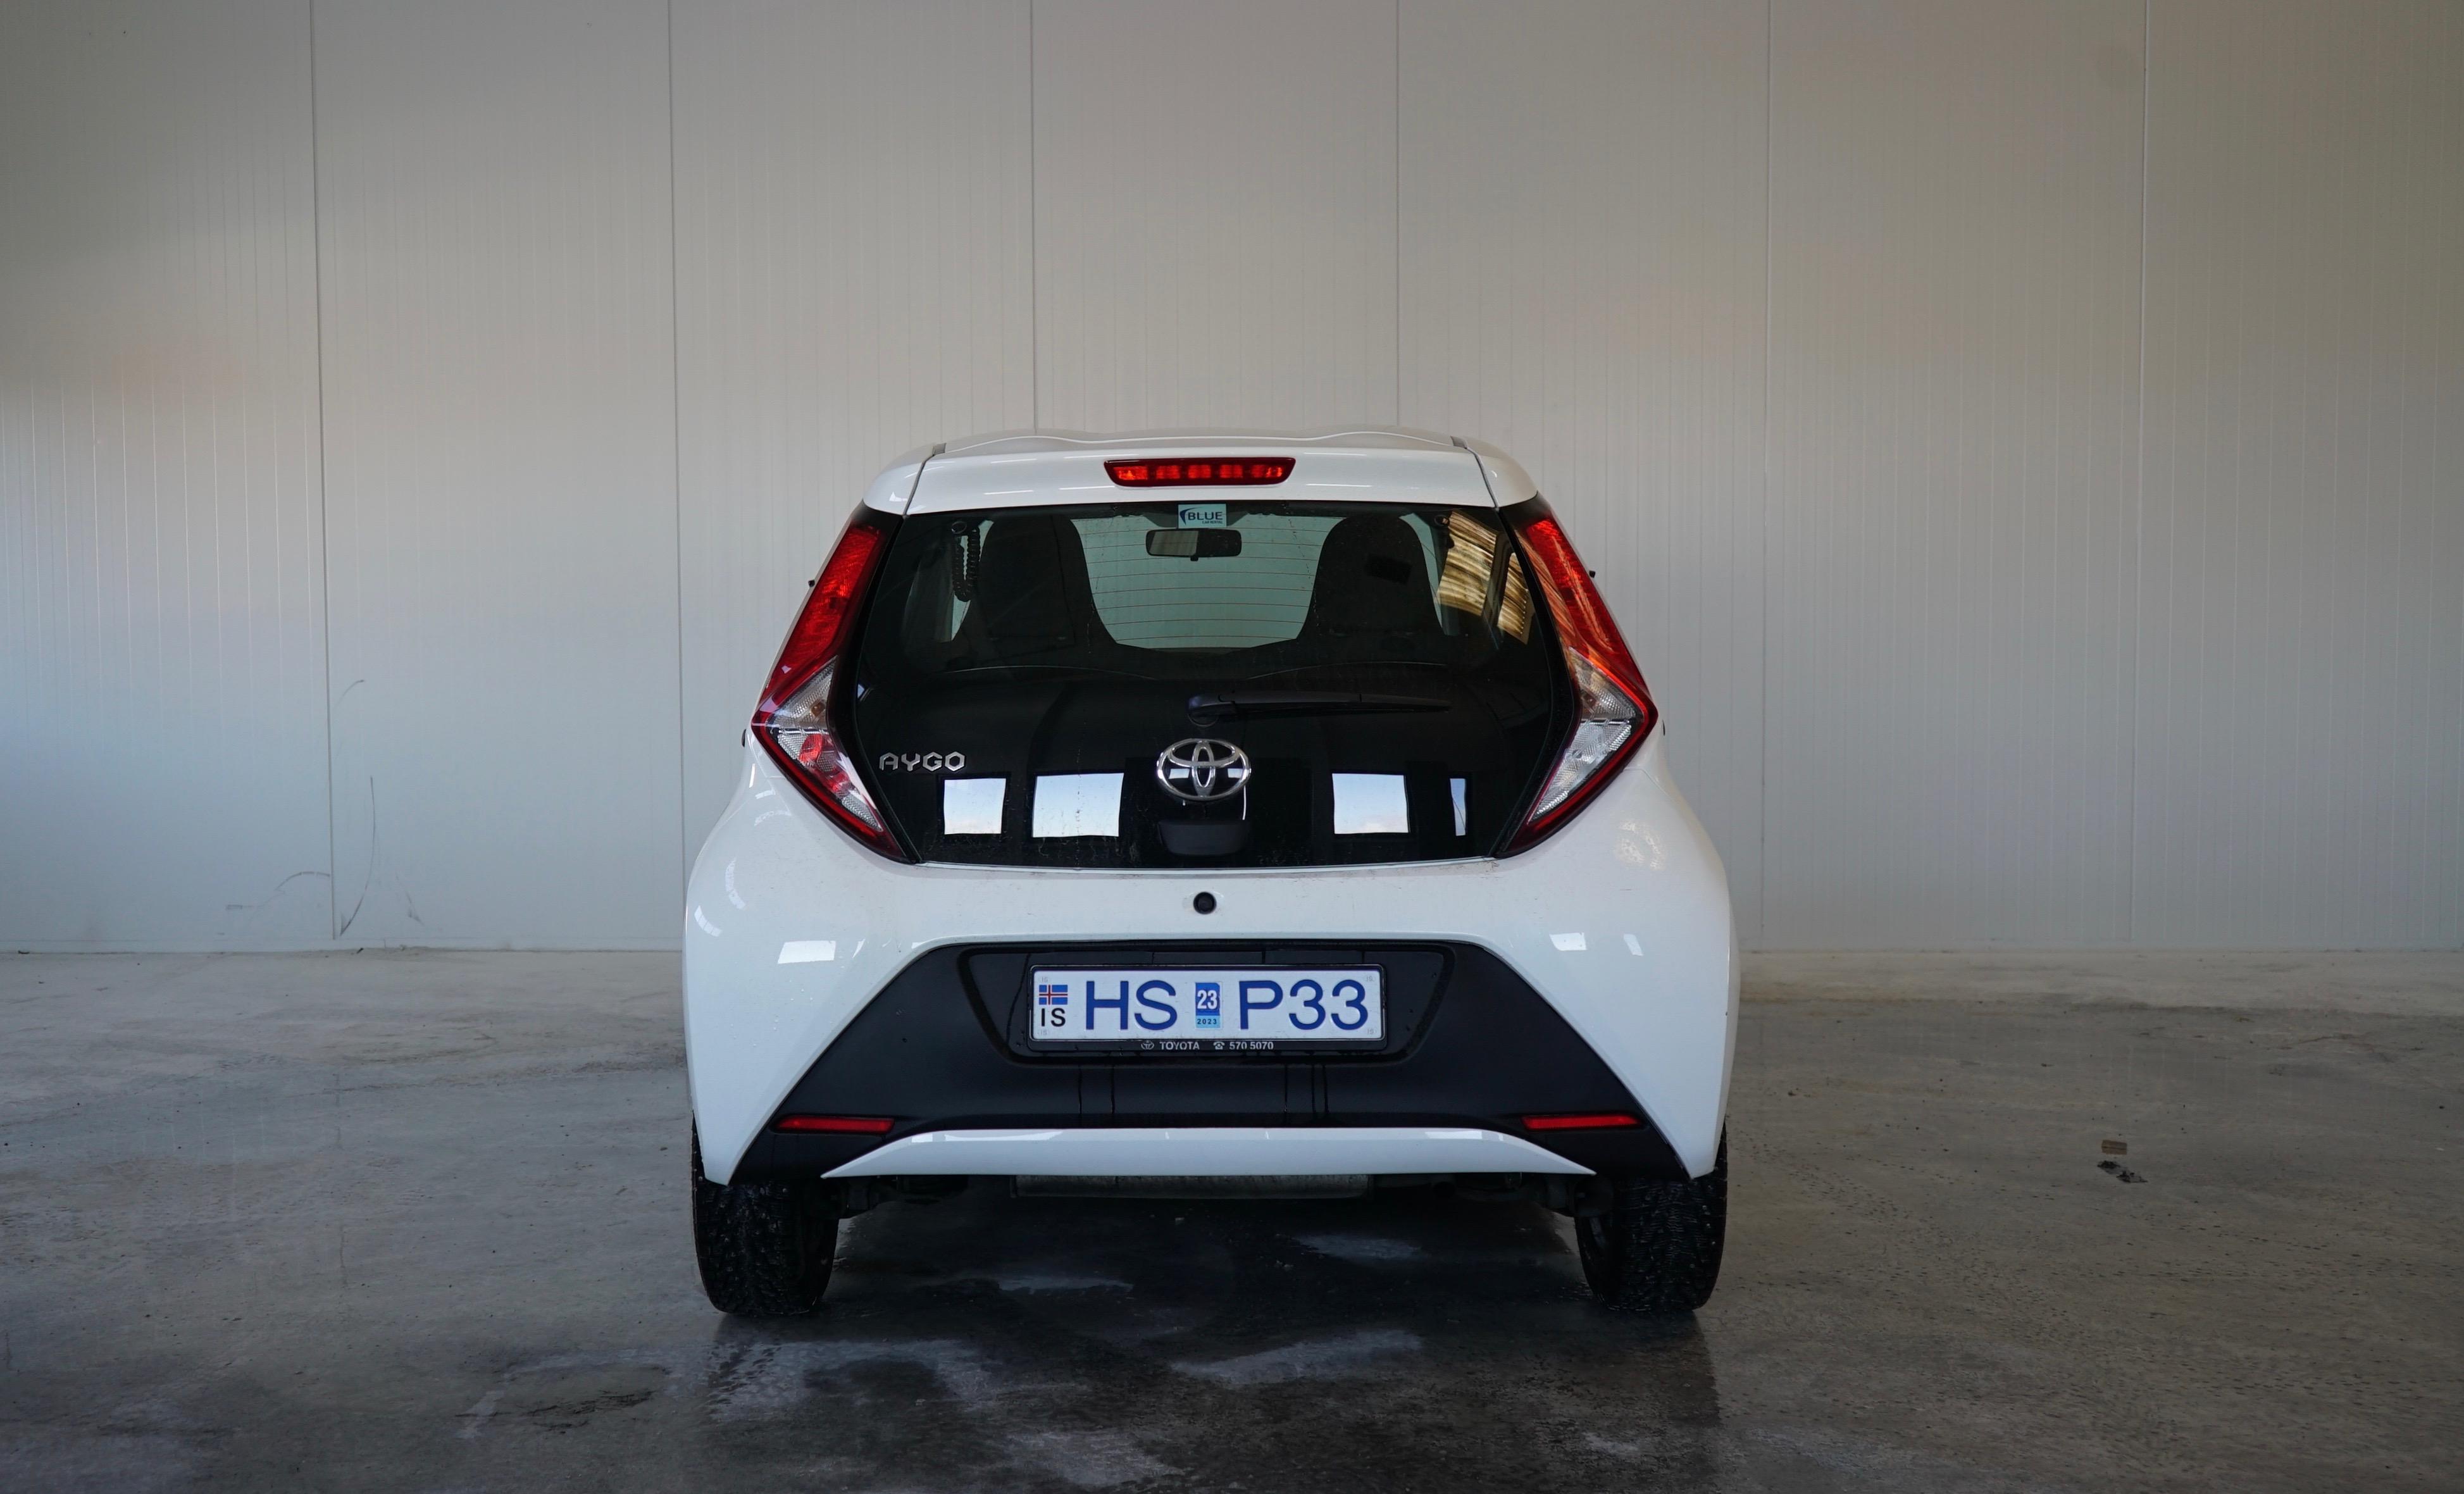 Toyota Aygo (automatic)